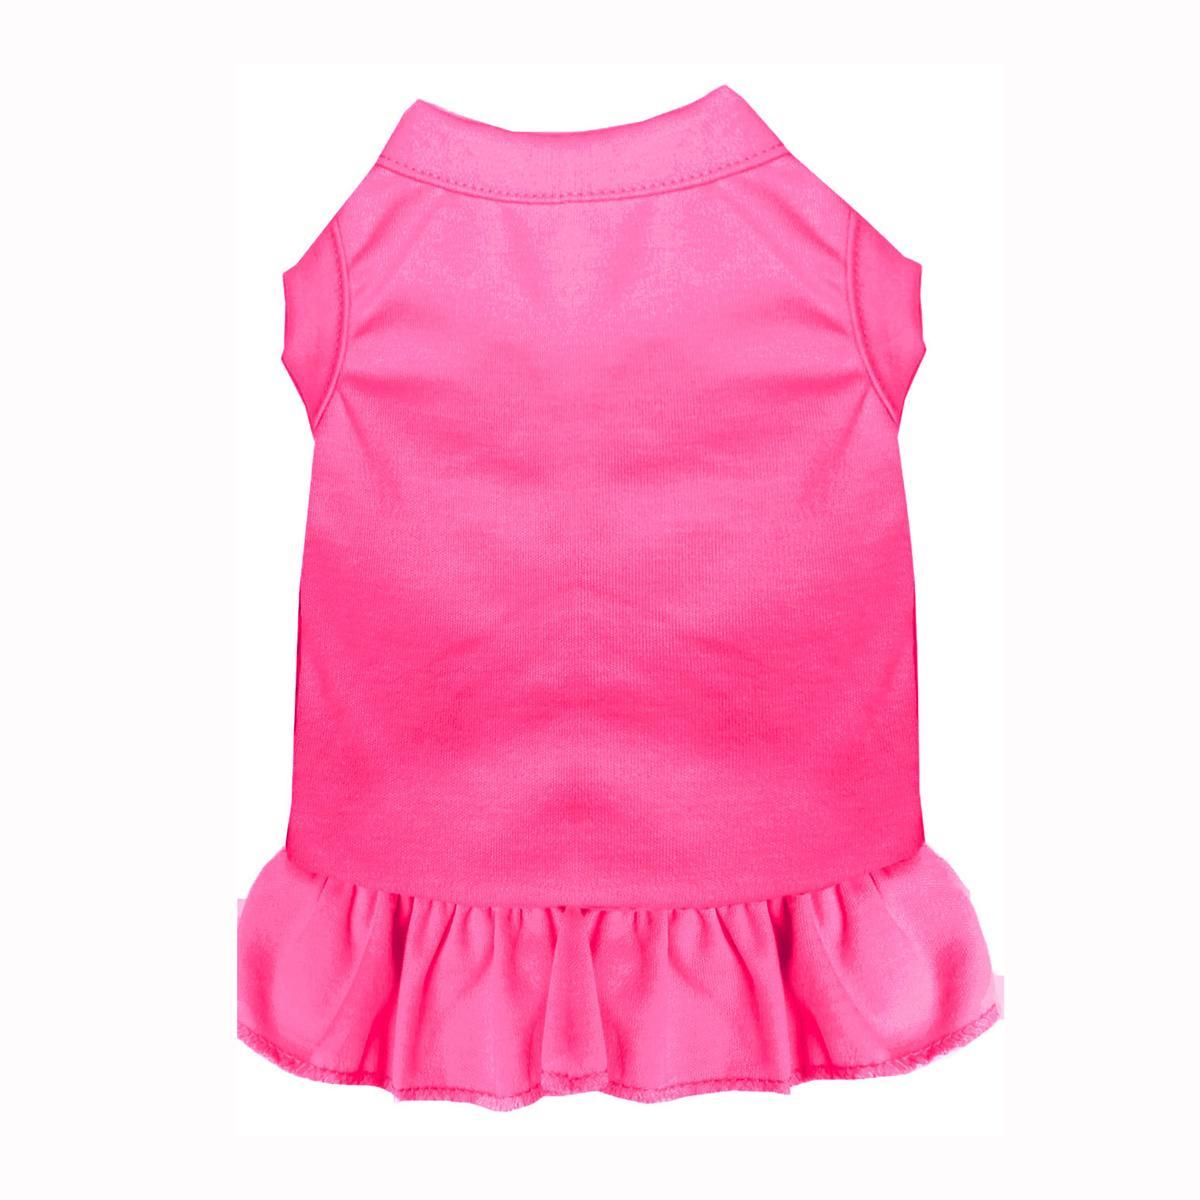 Plain Dog and Cat Dress - Bright Pink